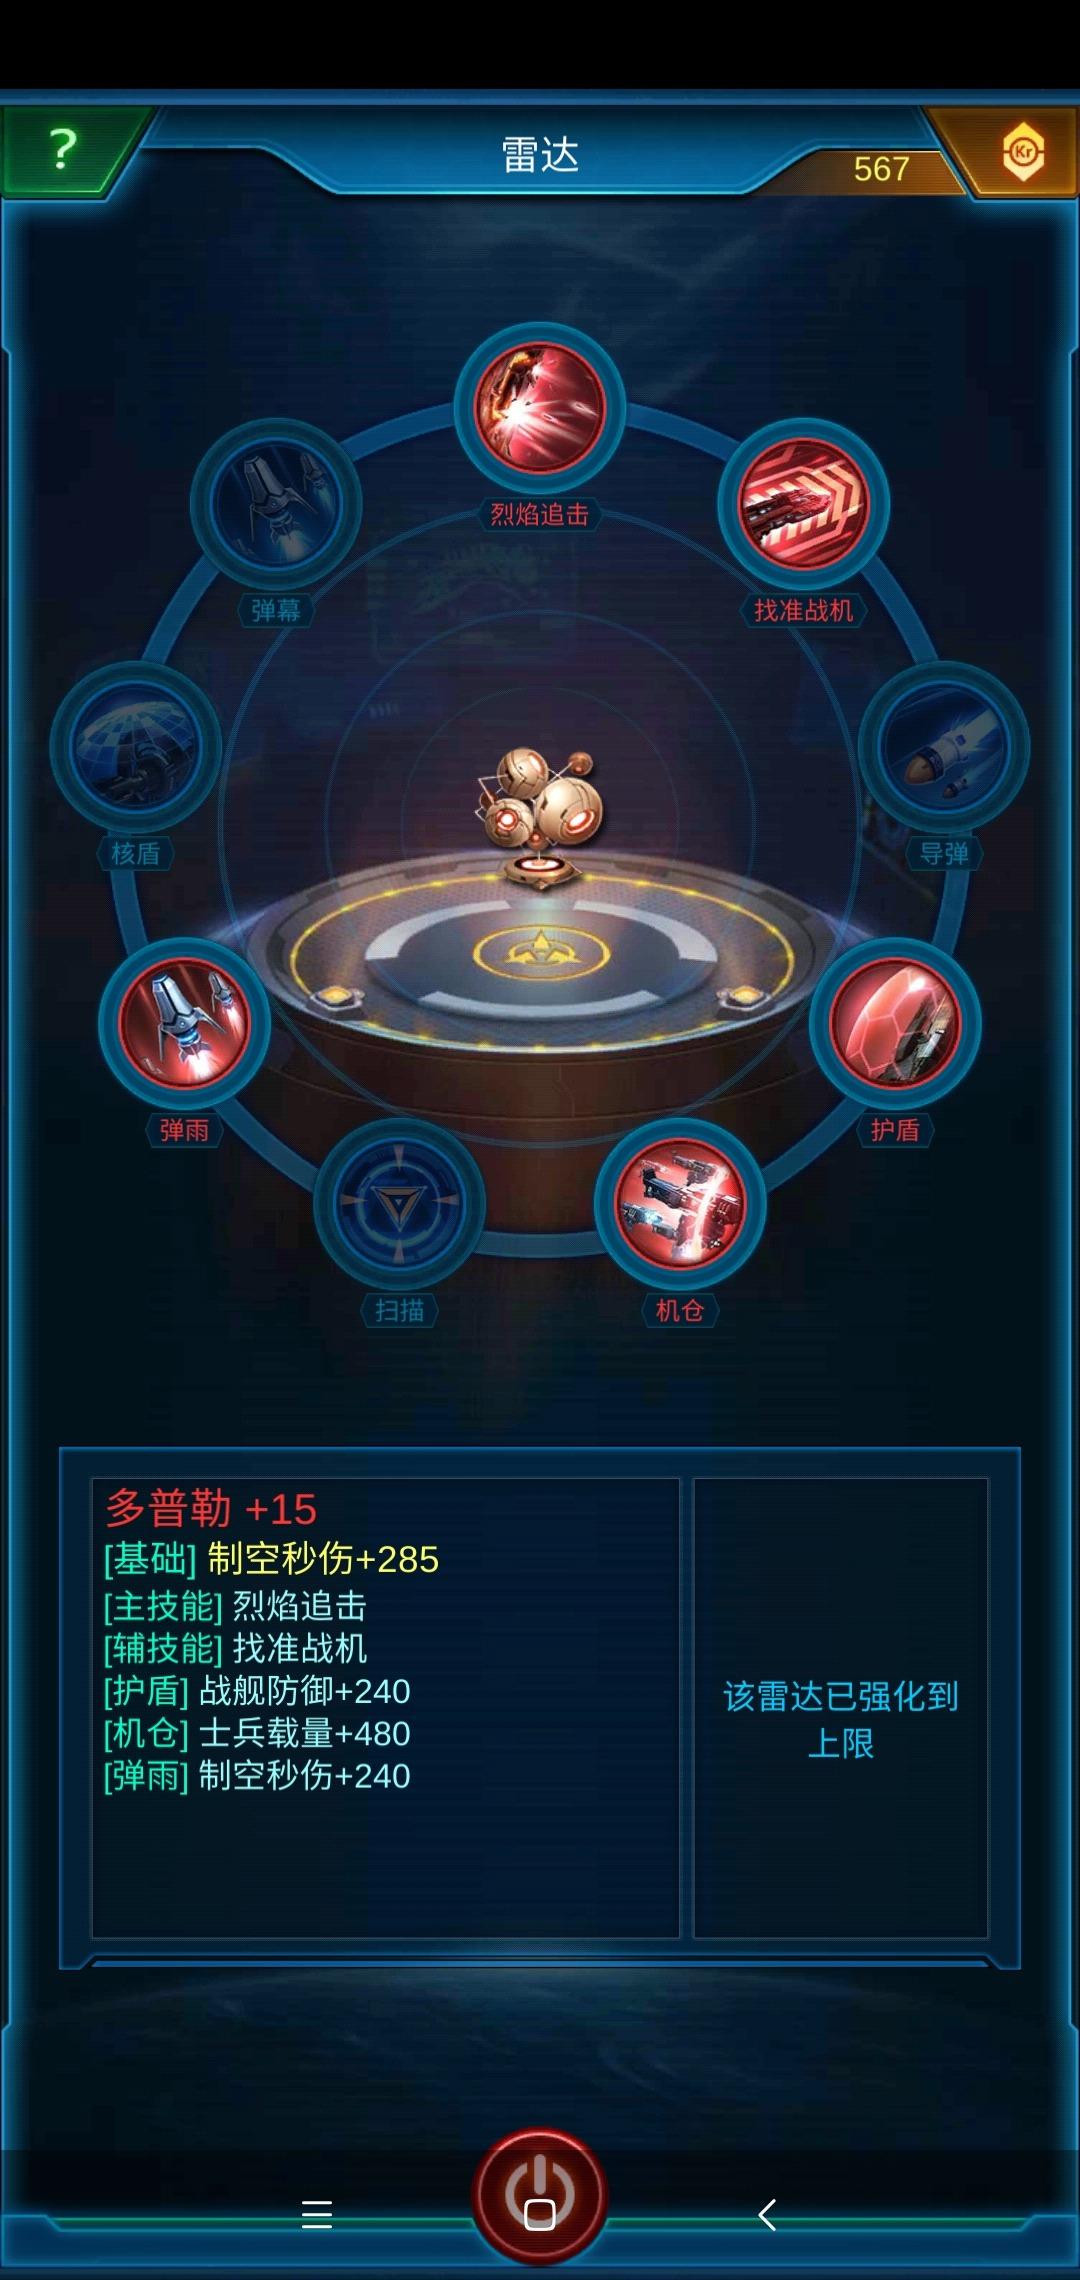 Screenshot_2020-05-06-06-27-19-378_com.tencent.tmgp.p16spxsk.jpg